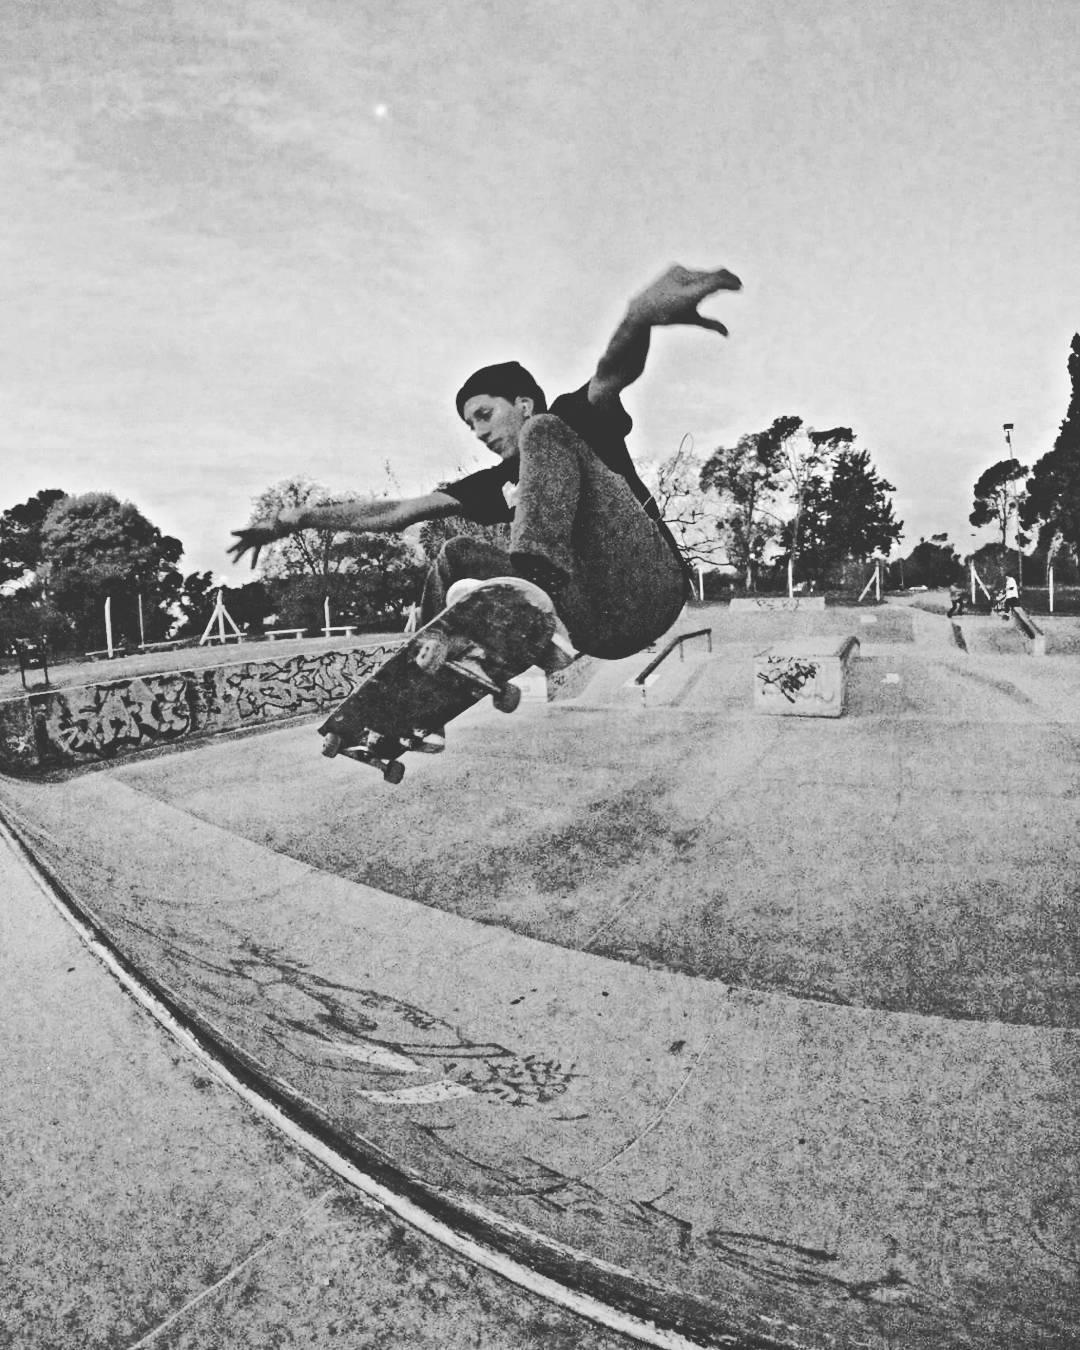 Nicolas Hernandez  Esquel - Chubut  #gotcha #iconsneverdie  #pchr #skateboarding